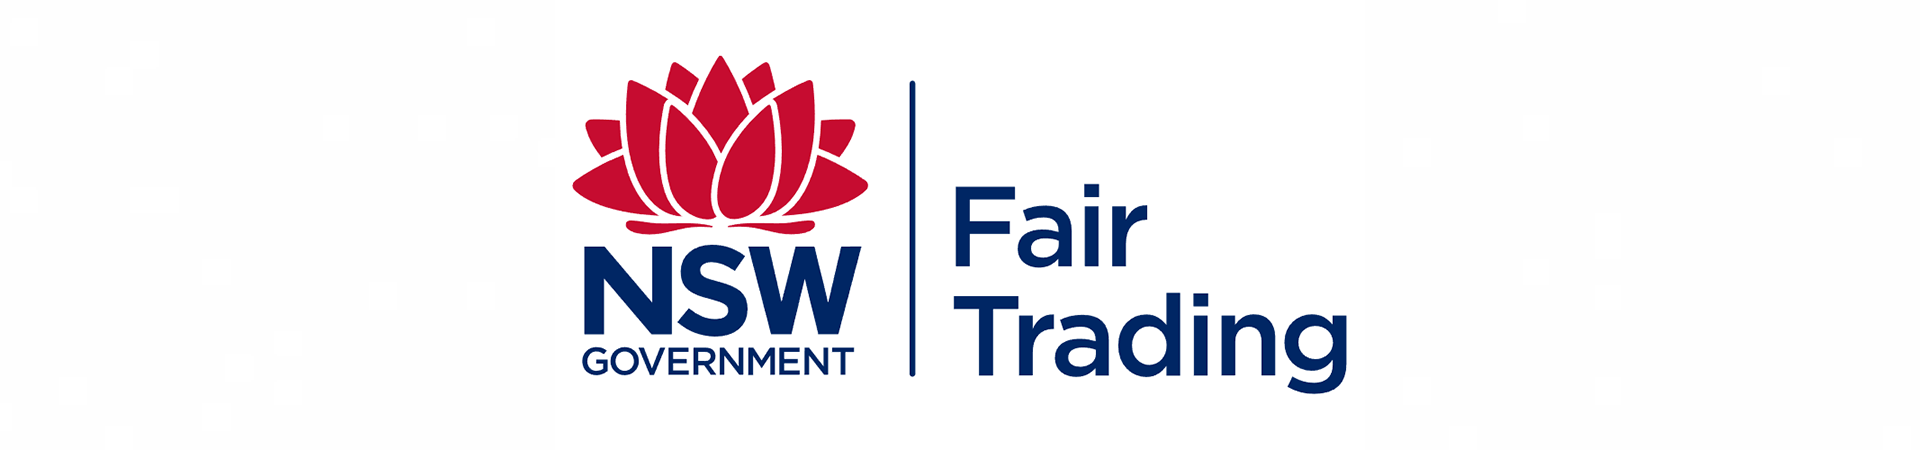 strata-nsw-fair-trading